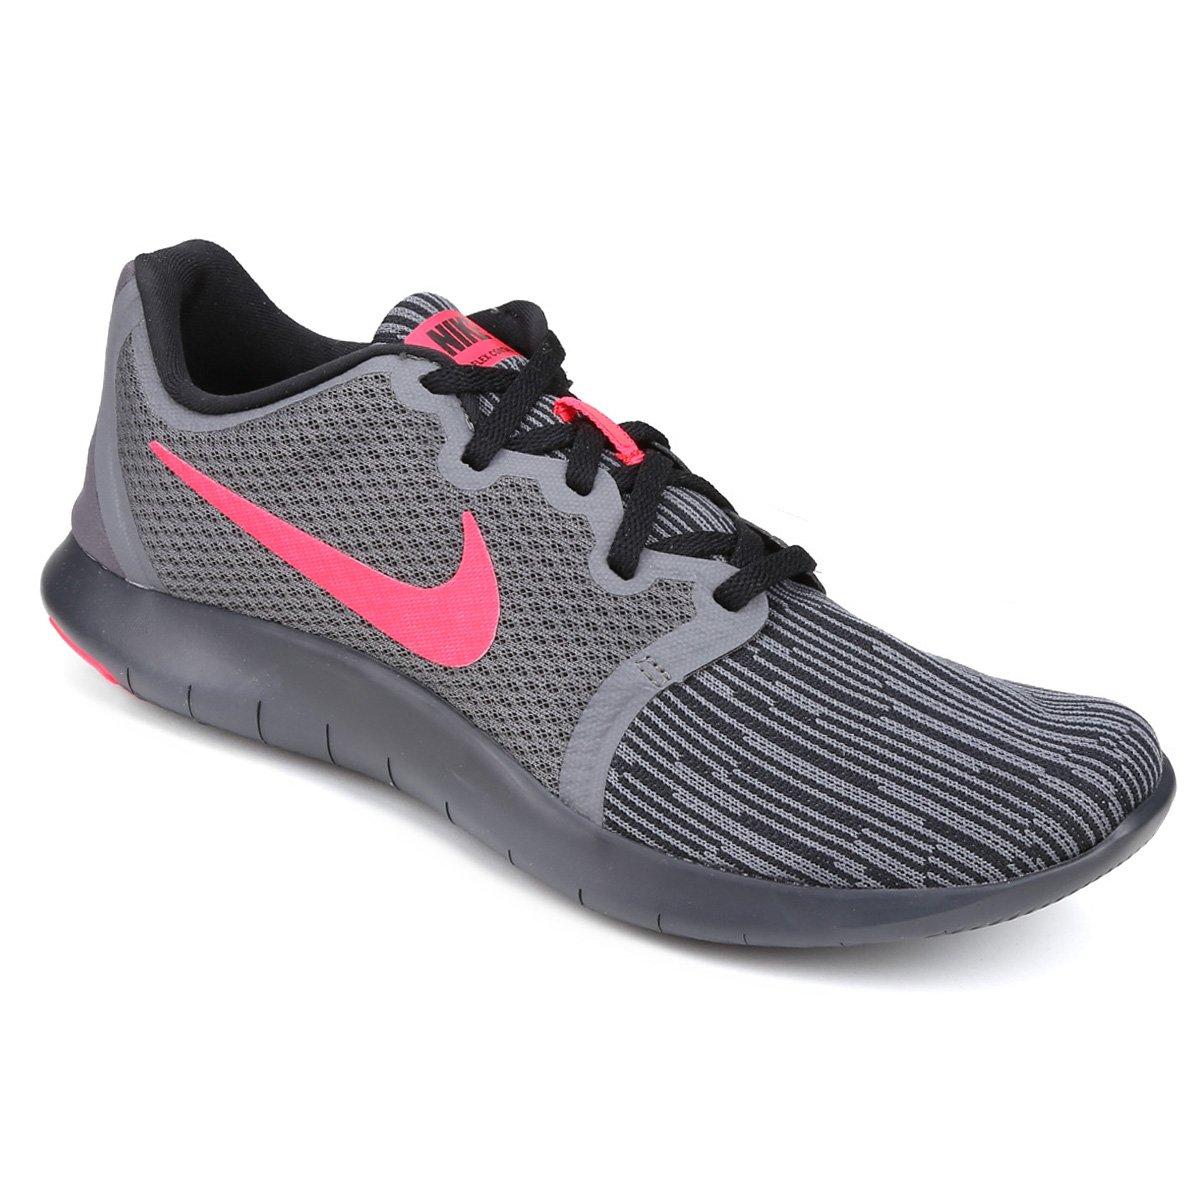 bb6cf195d1892 Tênis Nike Flex Contact 2 Masculino - Cinza e Rosa - Compre Agora ...